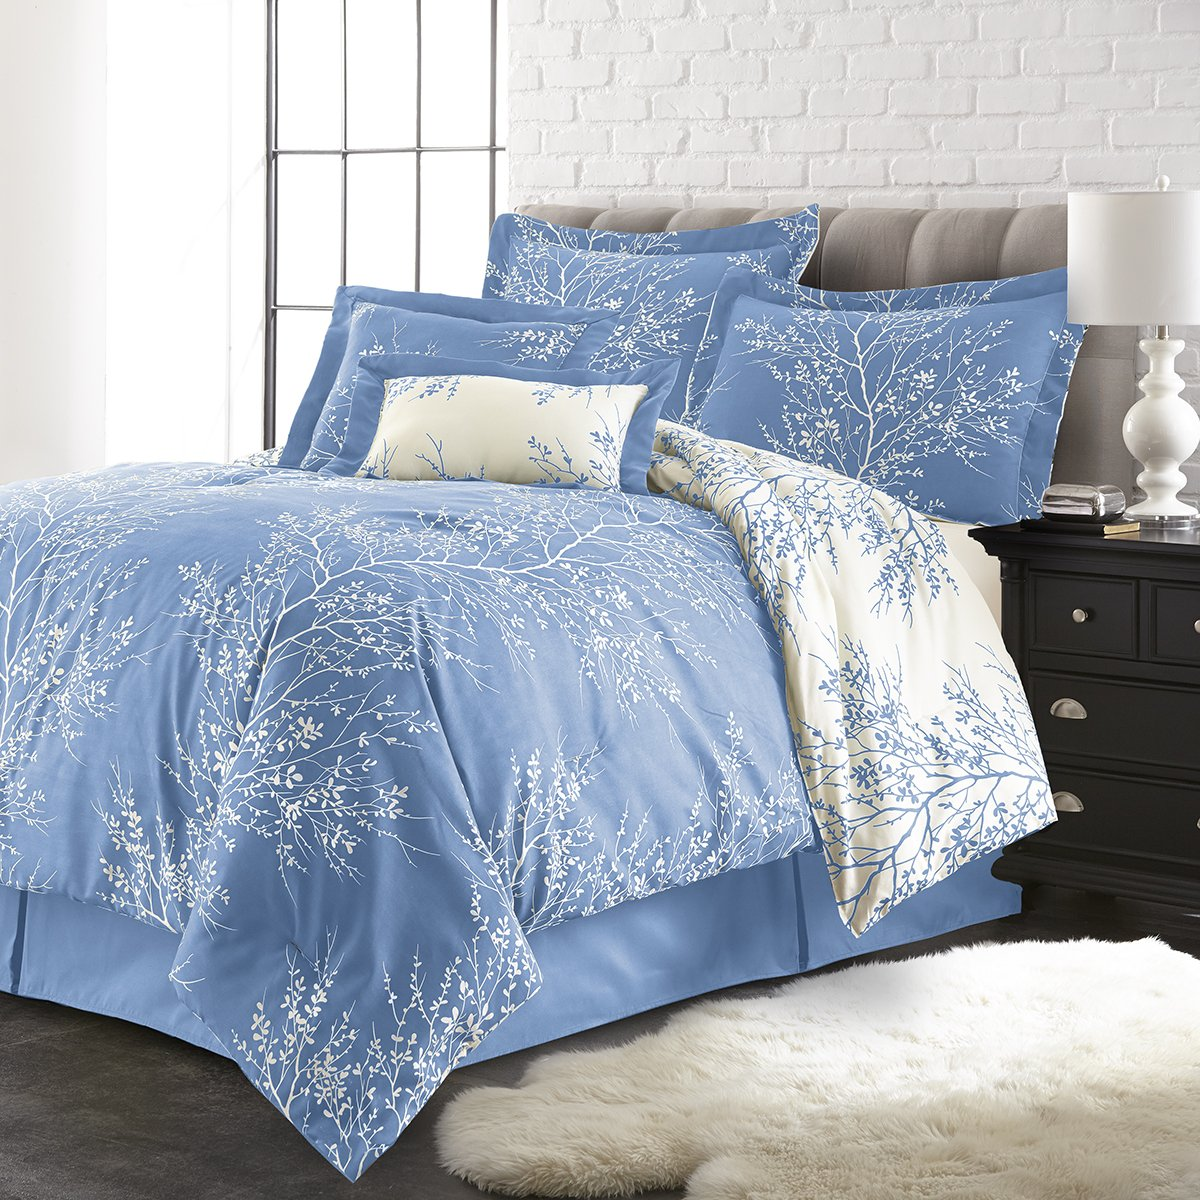 Spirit Linen Hotel 5Th Ave 6PCFOLCOMF-Lwq 6 Piece Plush Reversible Comforter Set, Queen, Lilac/White